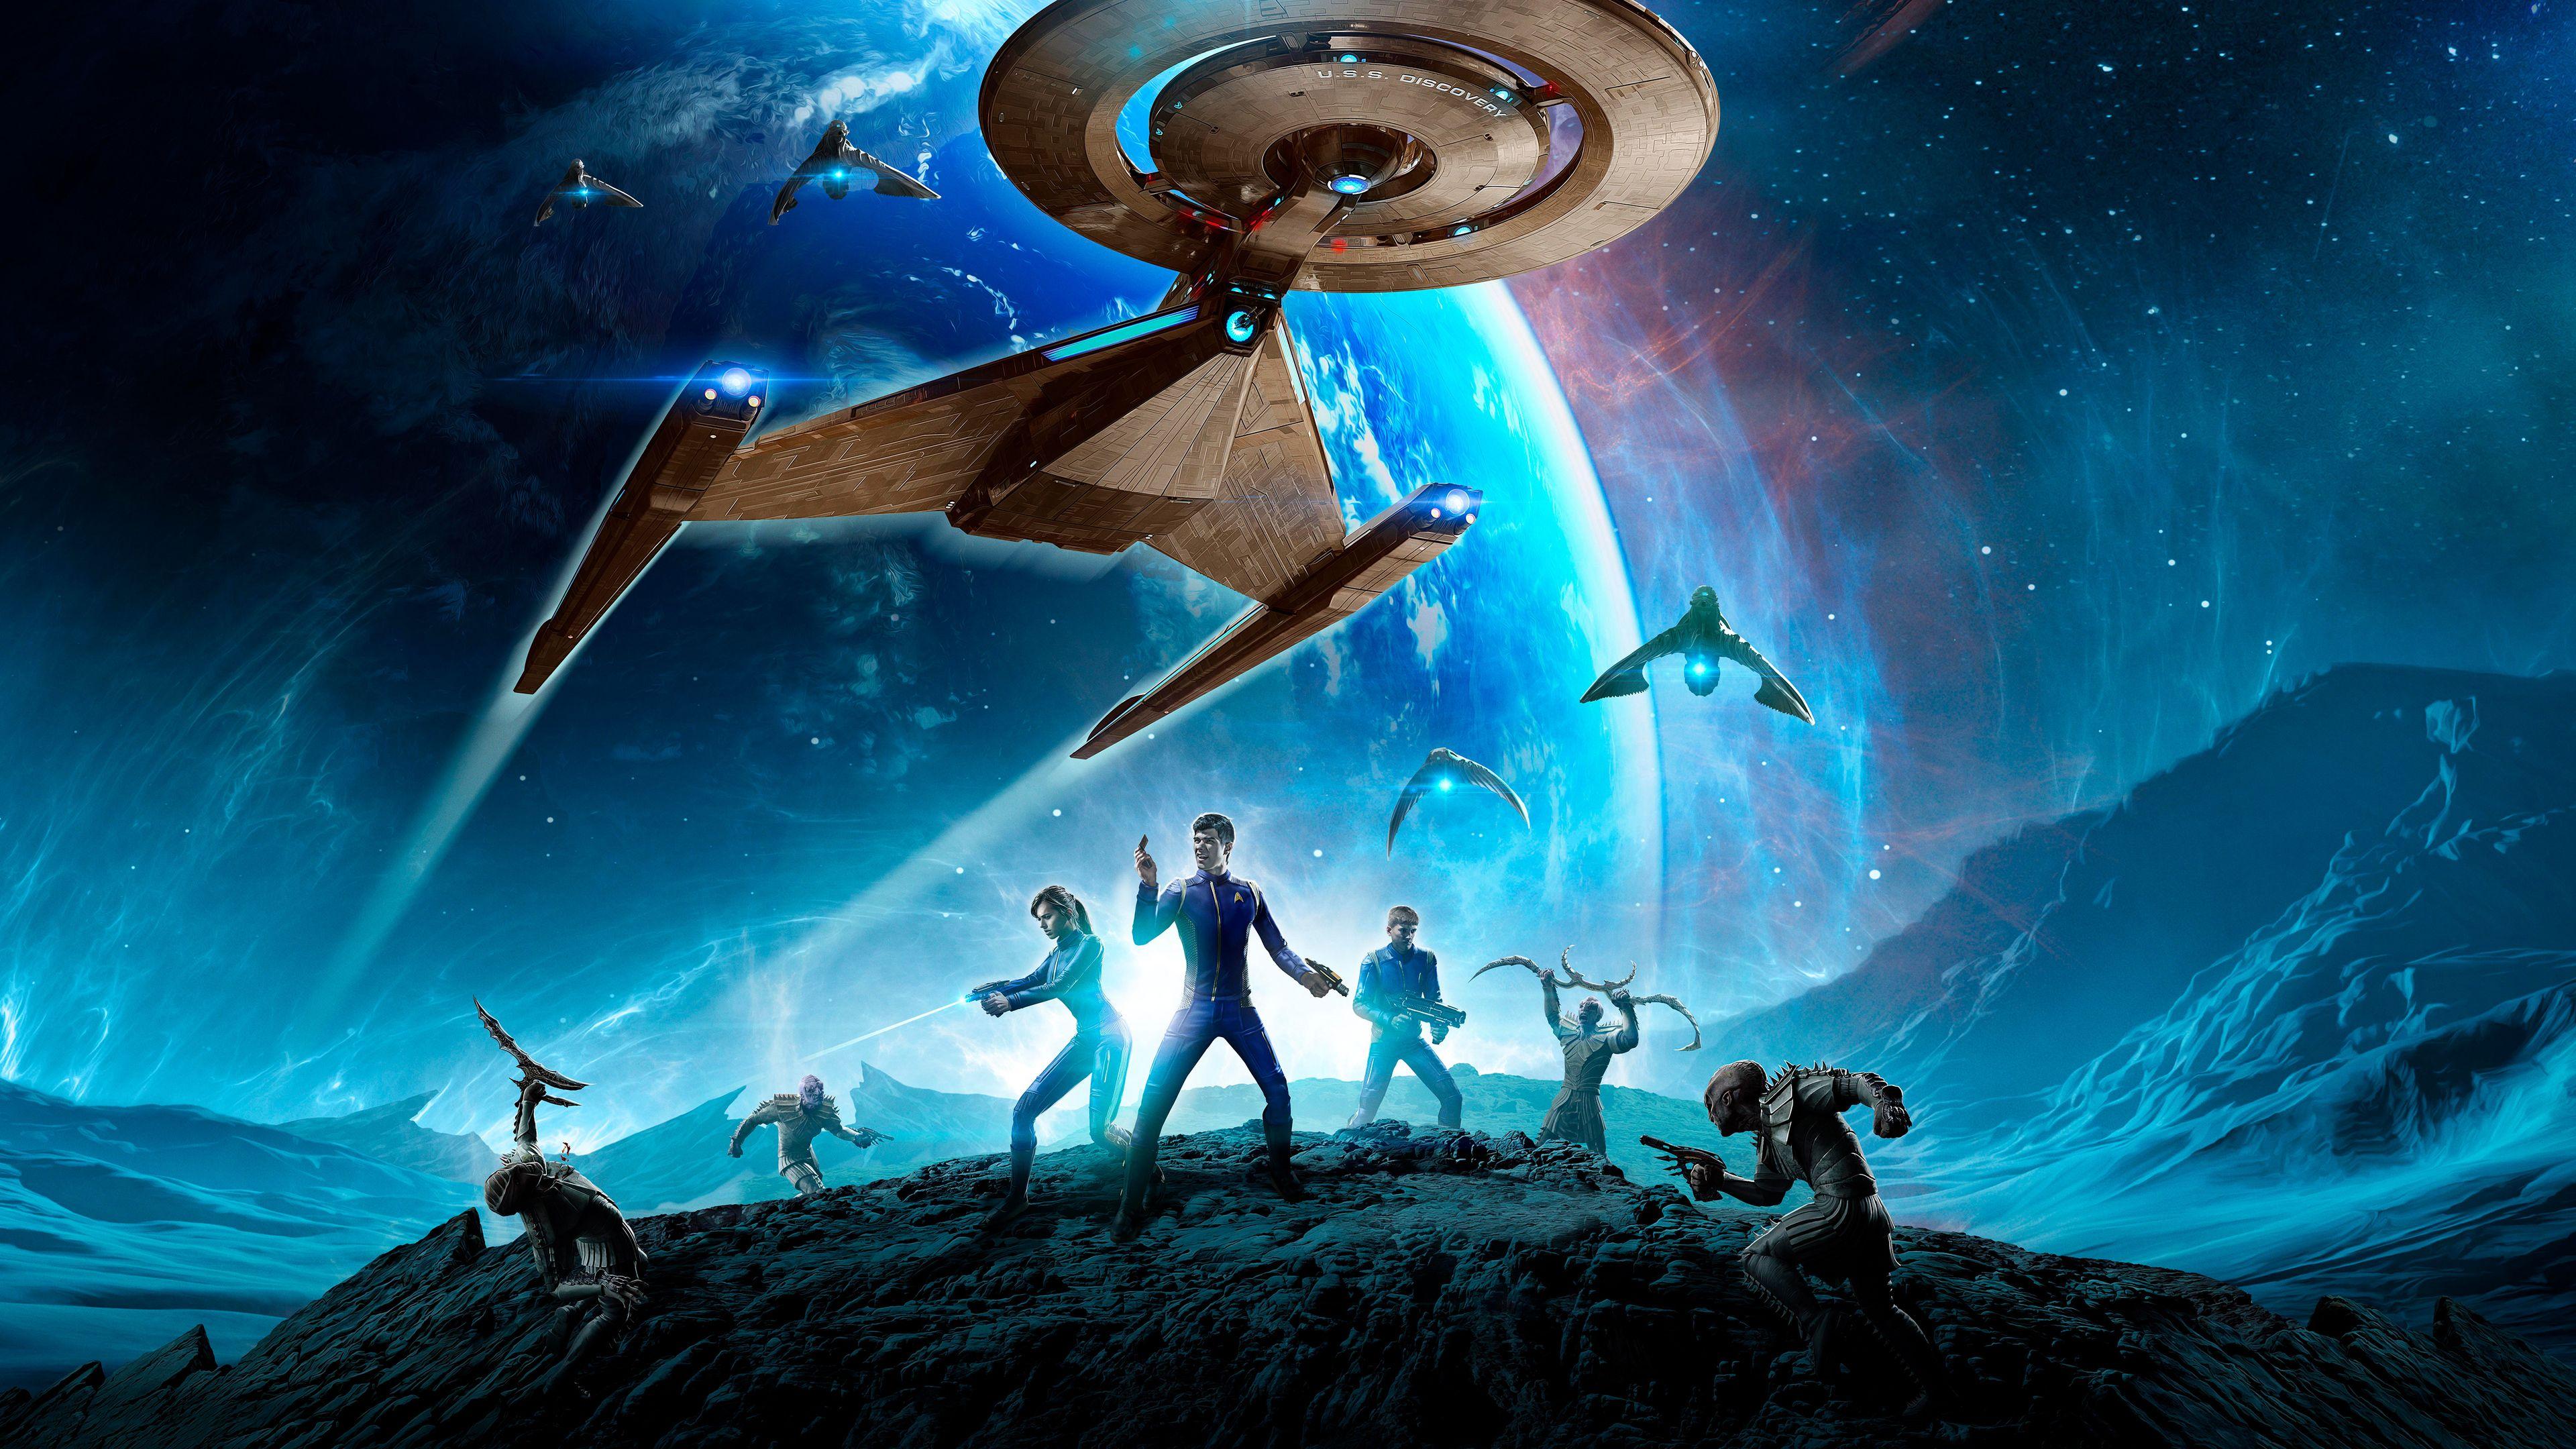 Star Trek Online Video Game Hd Wallpapers Games Wallpapers 5k Wallpapers 4k Wallpapers Star Trek Online Online Video Games Star Trek